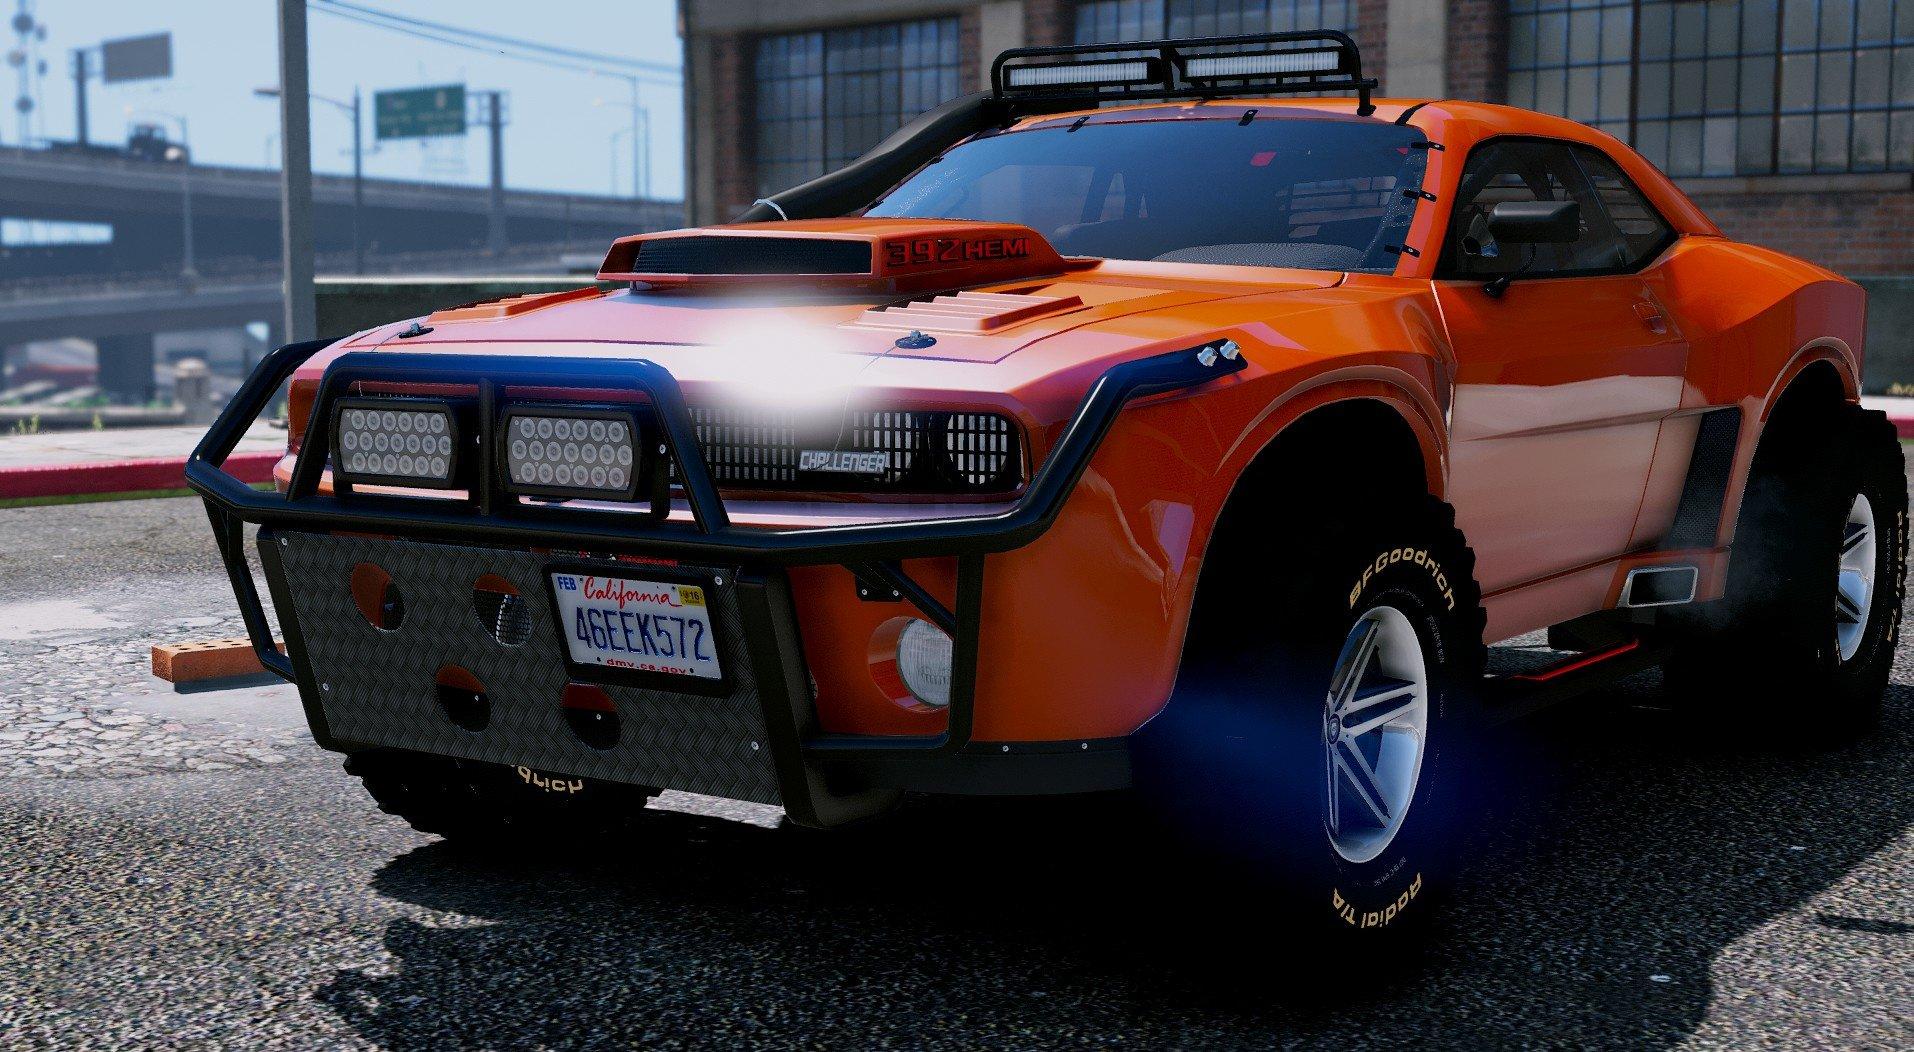 Dodge Challenger Raid Add On Vehicules Pour Gta V Sur Gta Modding